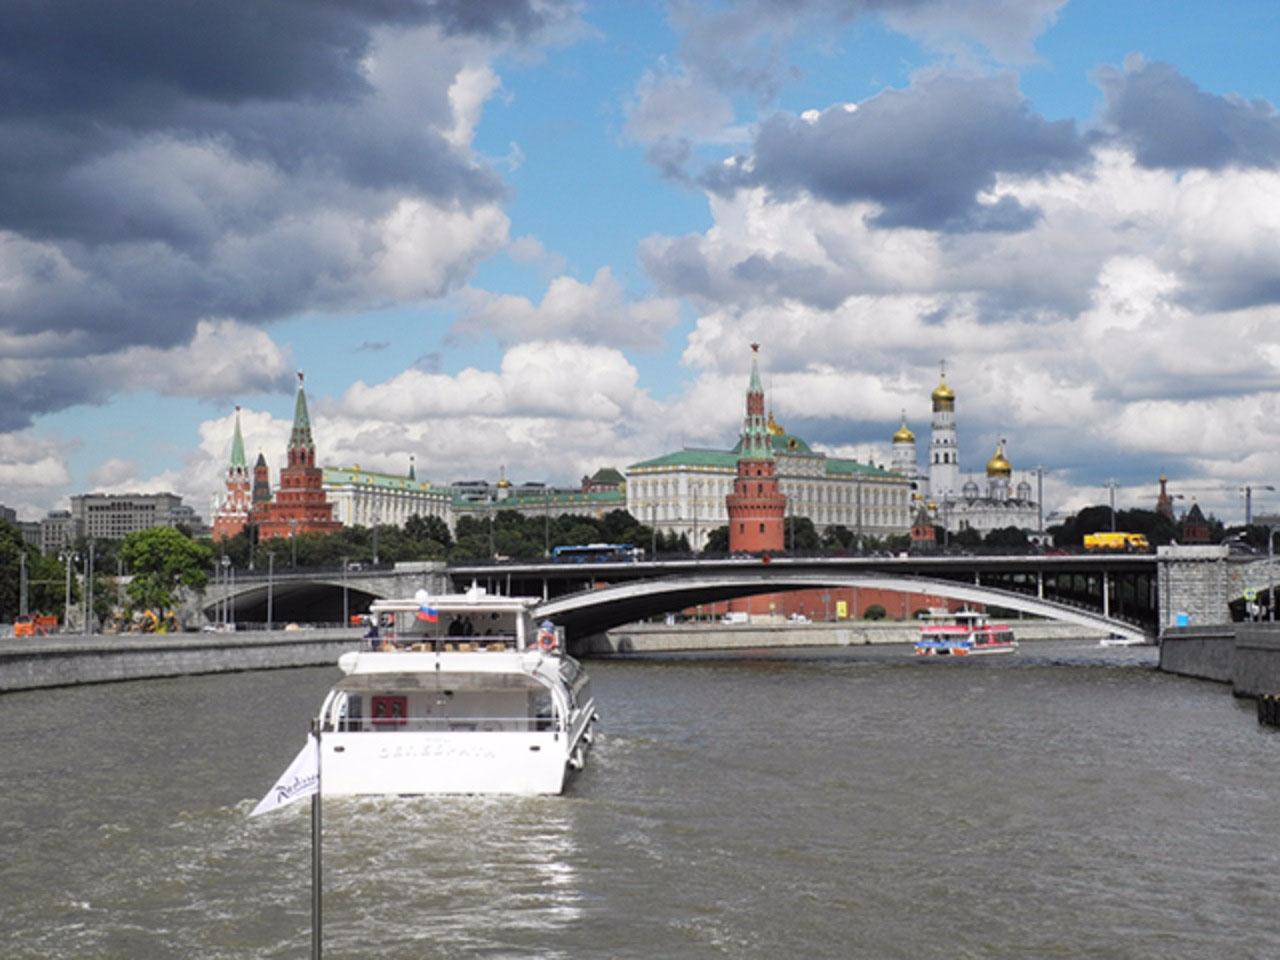 Arriving at the Kremlin